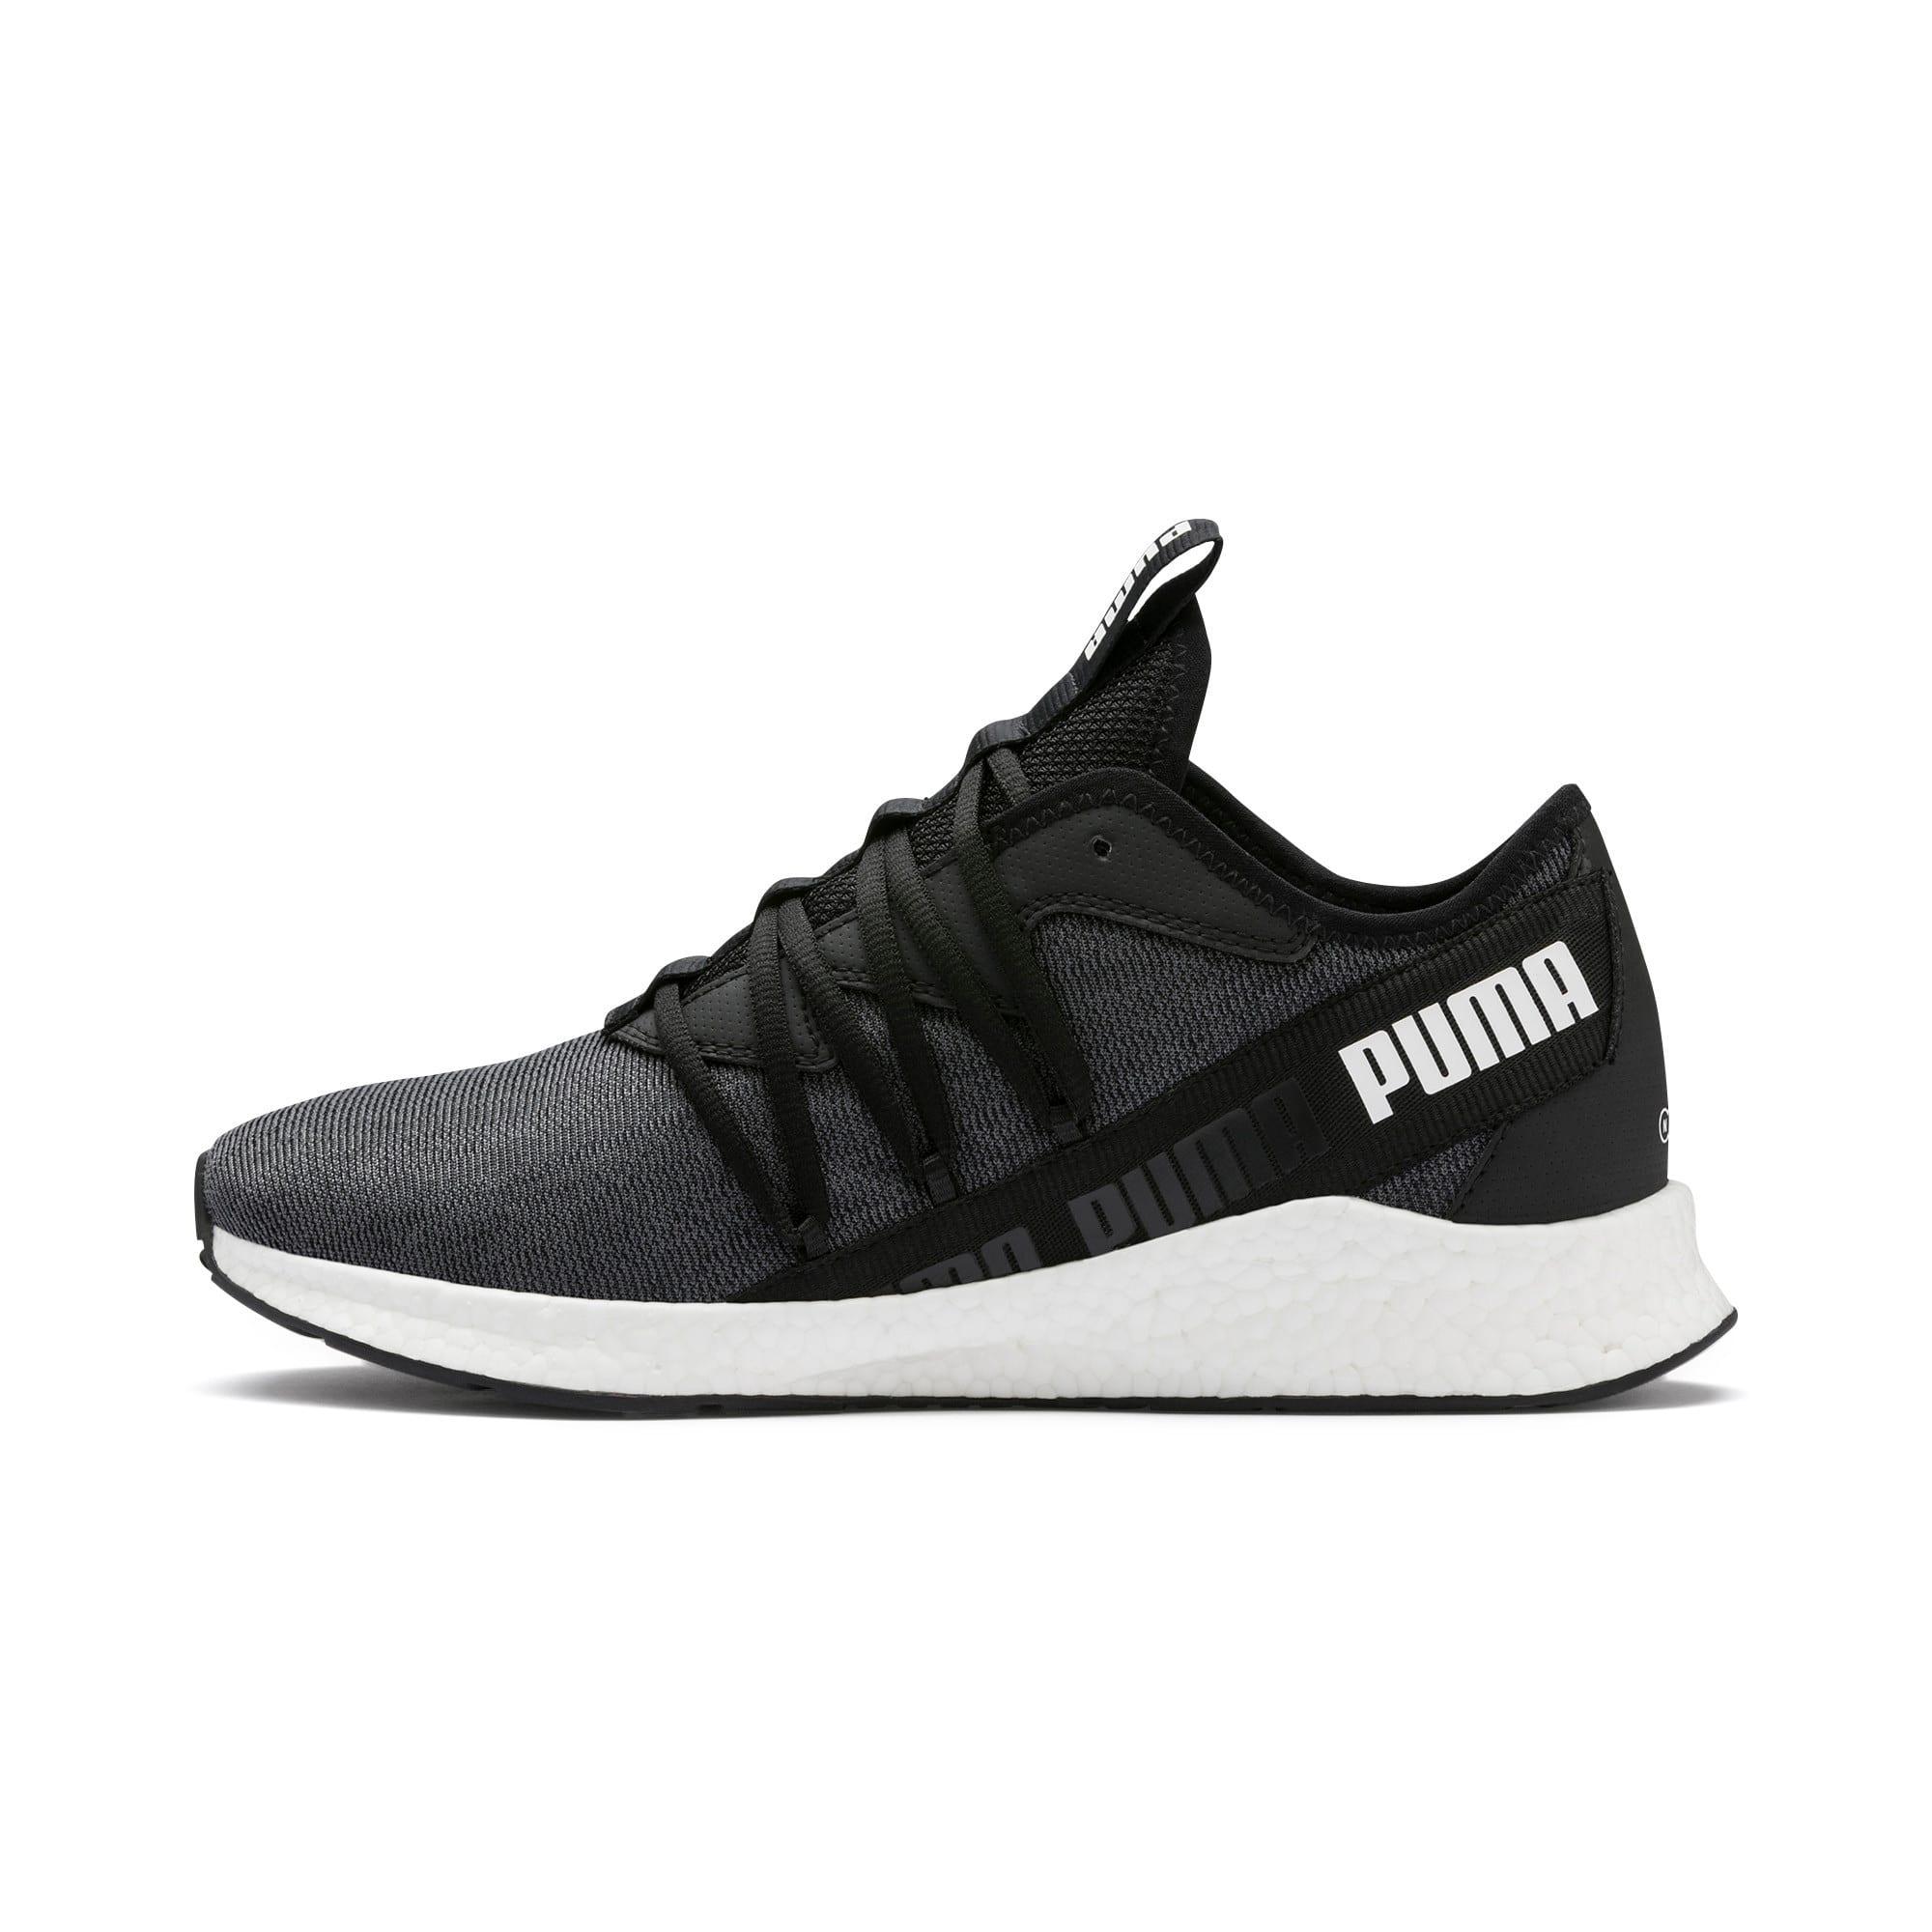 Thumbnail 1 of NRGY Star Knit Running Shoes, Puma Black-Puma White, medium